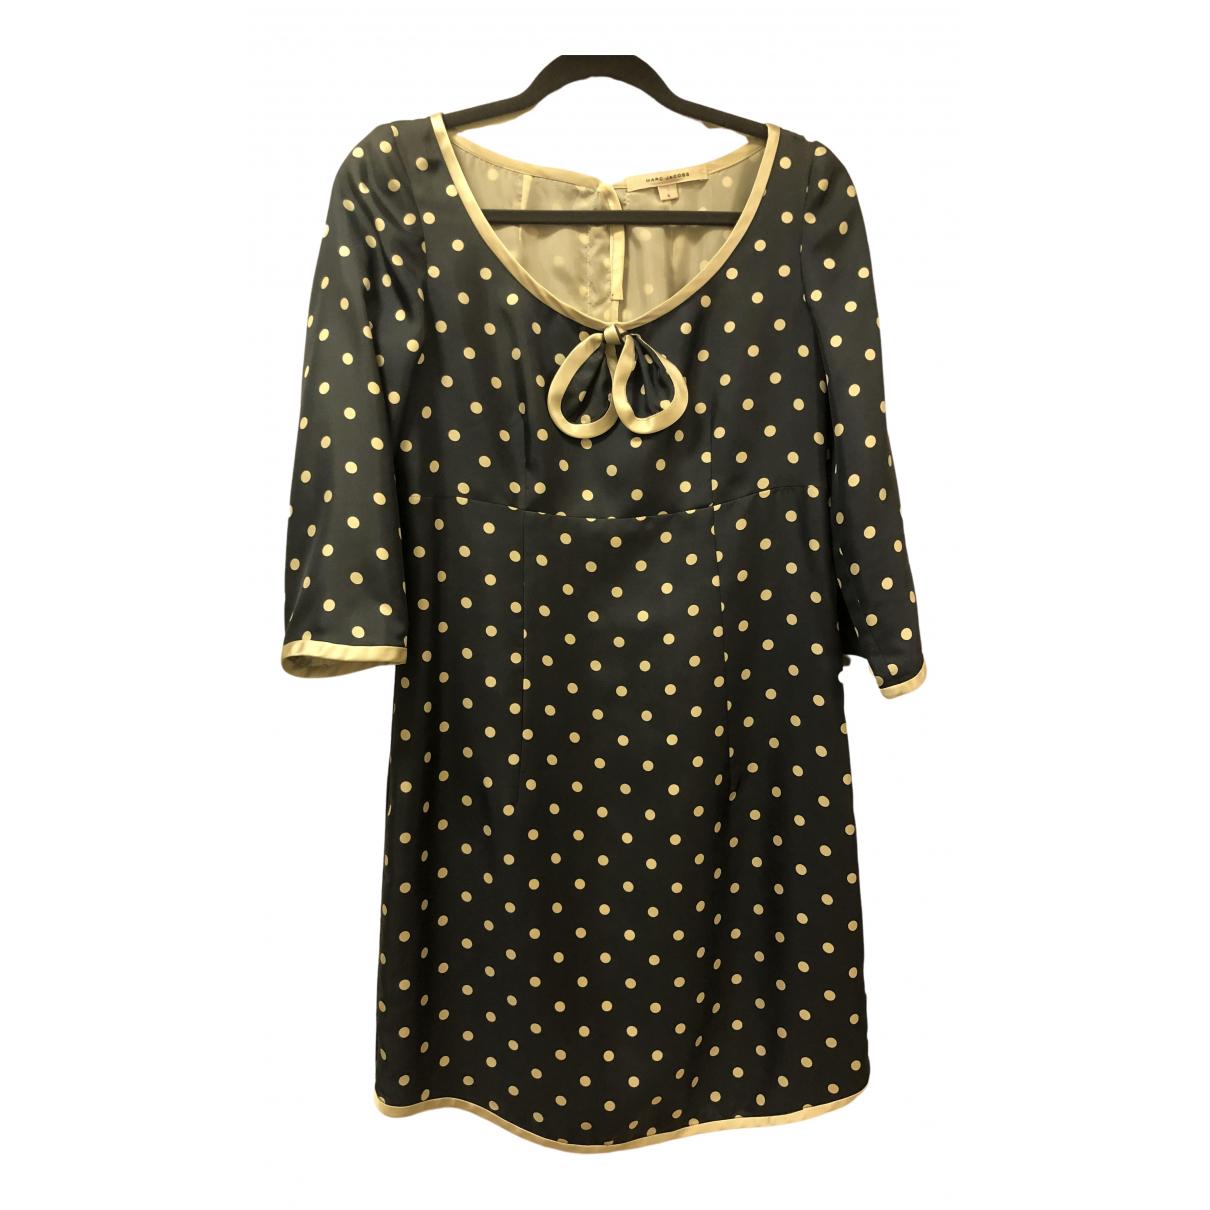 Marc Jacobs \N Navy Silk dress for Women 4 0-5